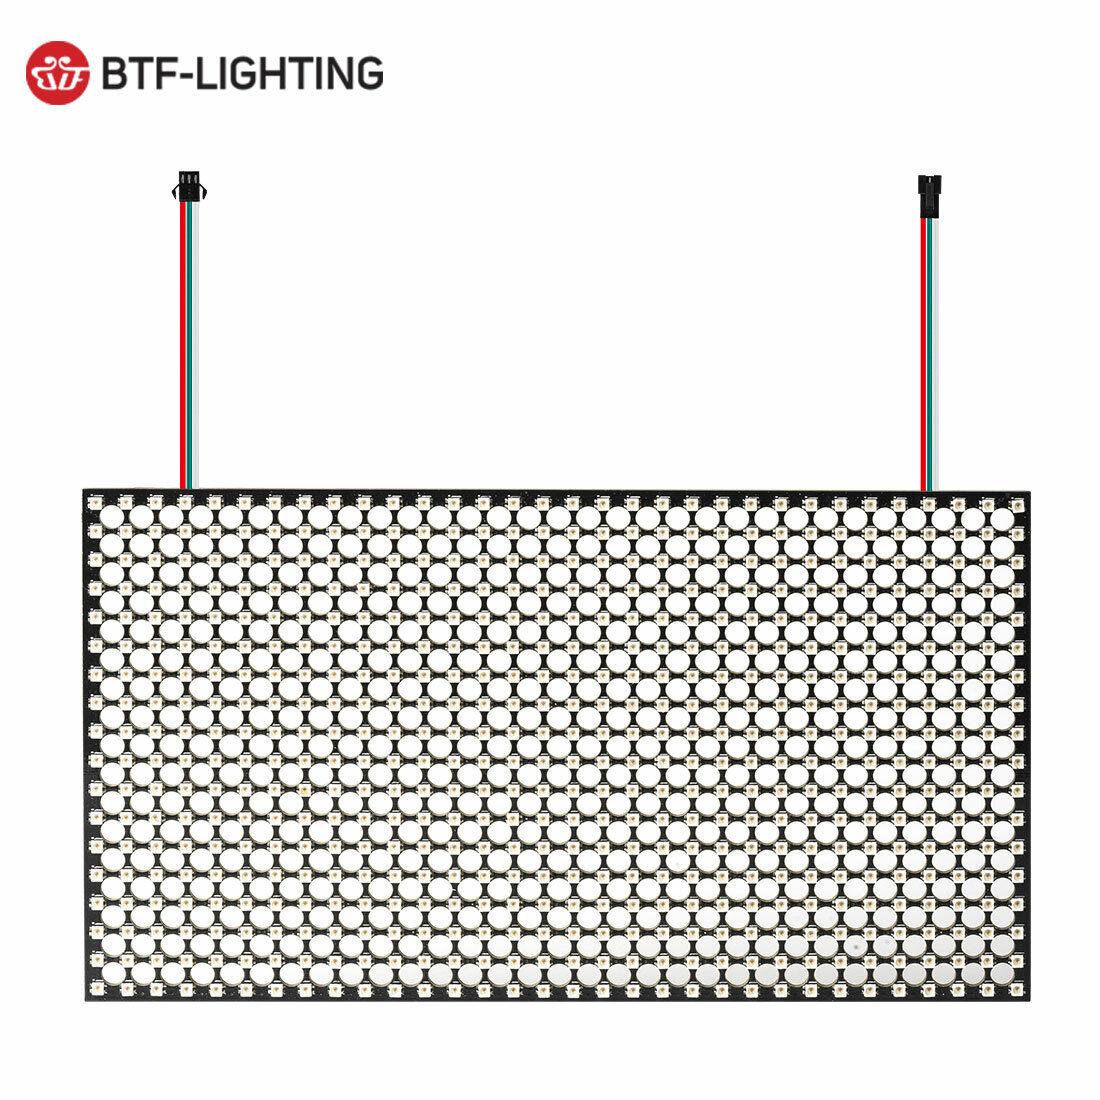 18x32 576 píxel ws2812b 2020smd RGB LED matrix panel 5v individualmente responde